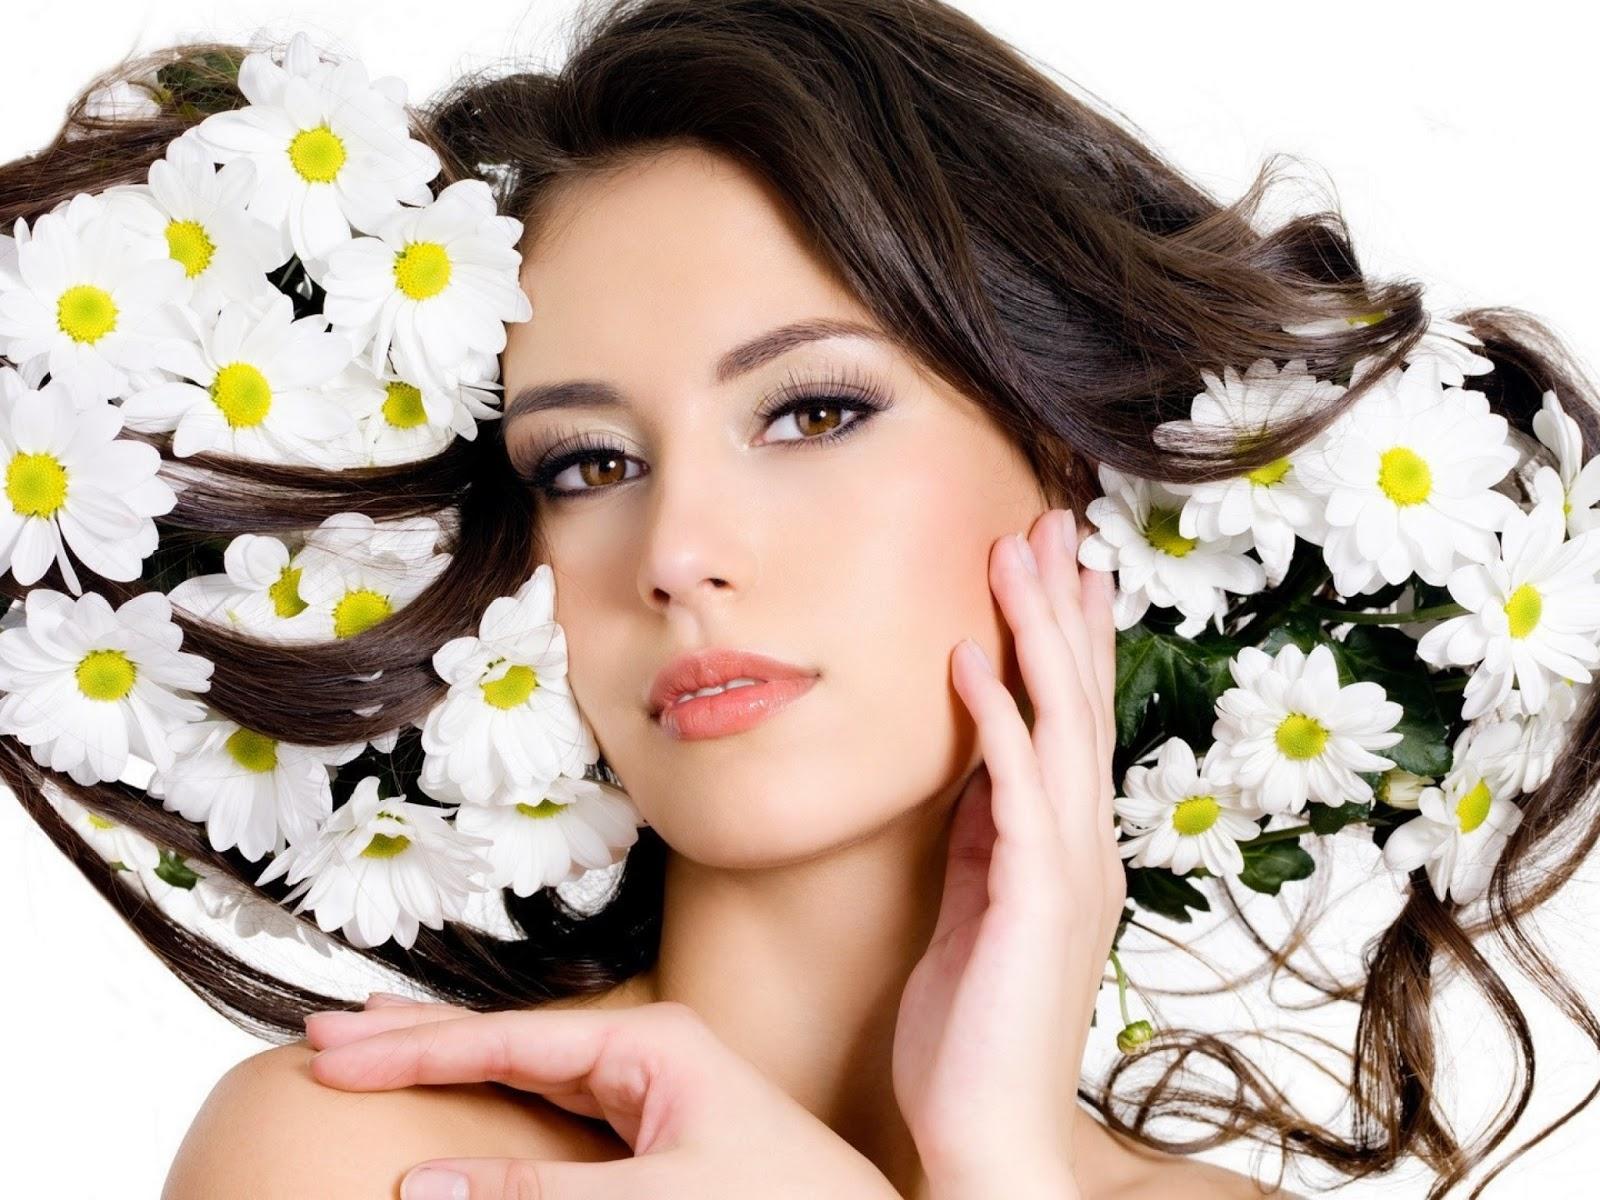 Girls Like Flower | Creative Hd Wallpapers